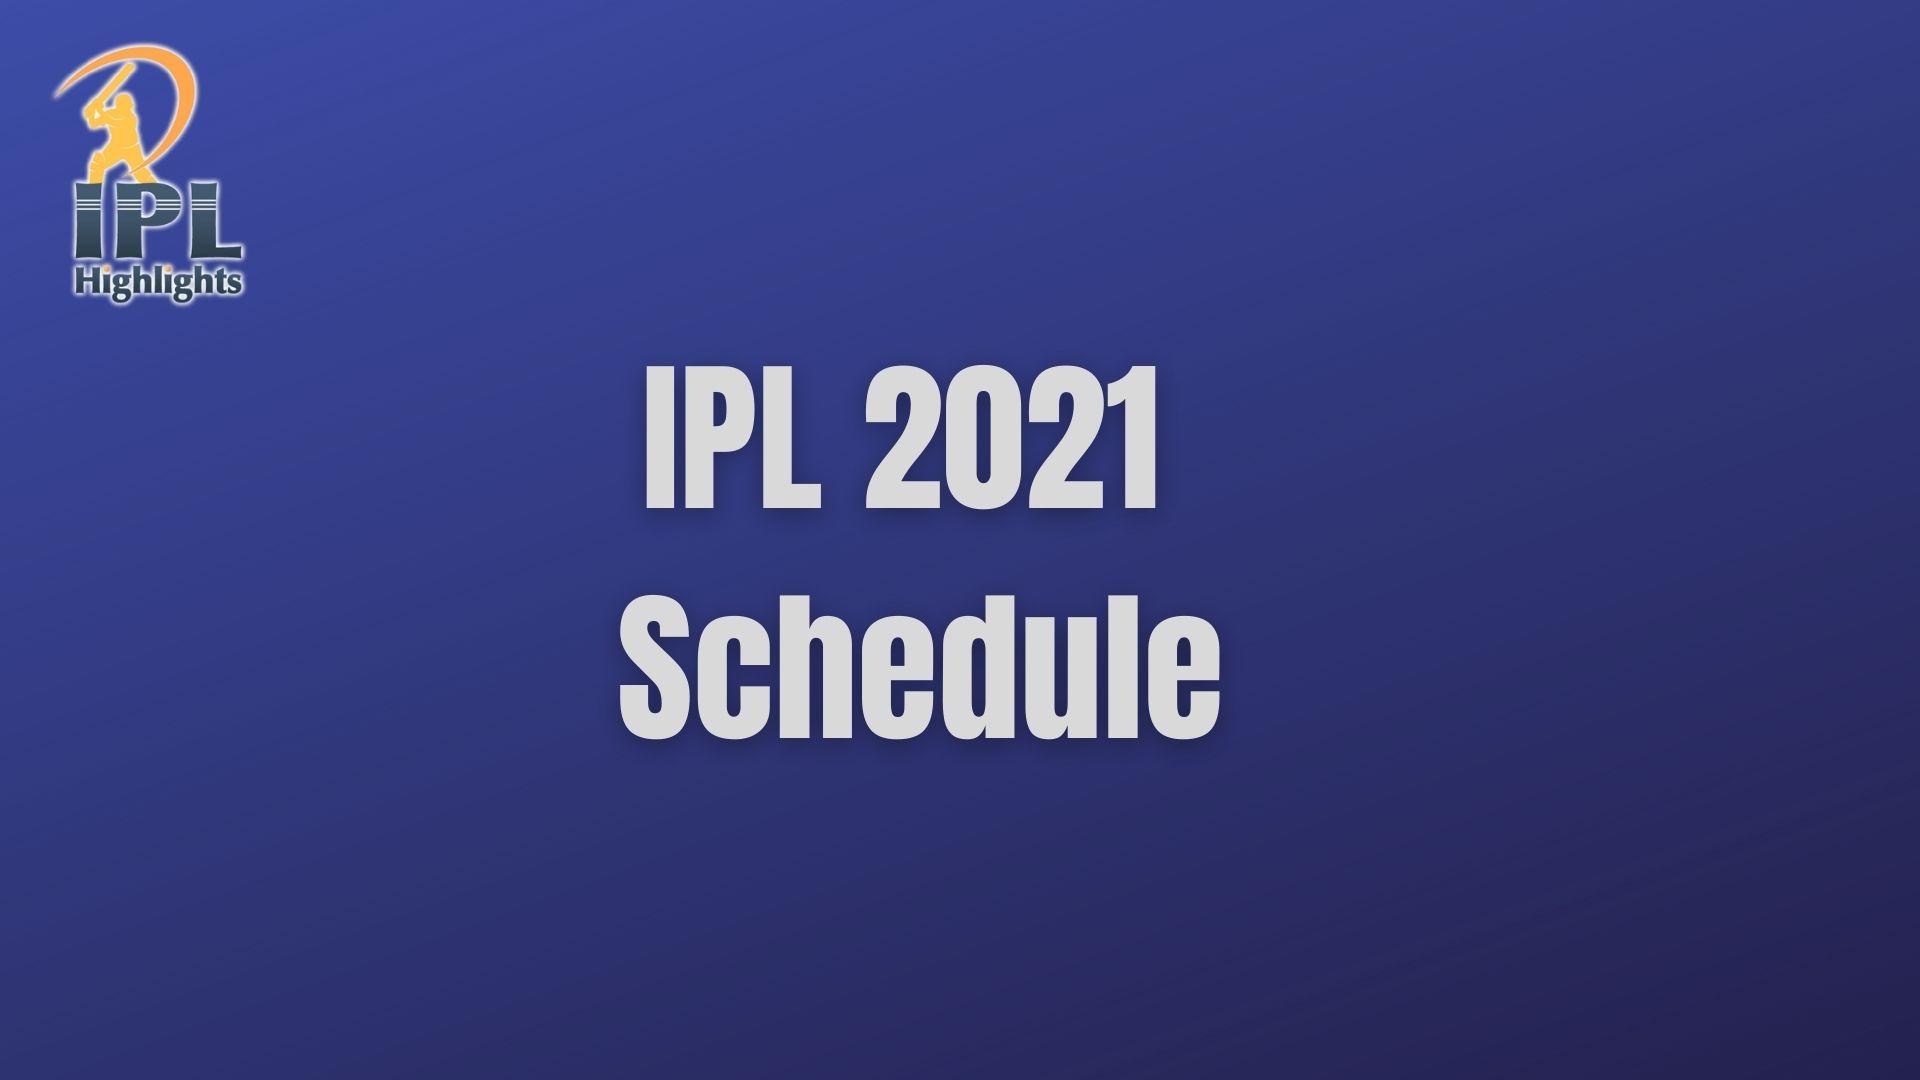 ipl2021 schedule